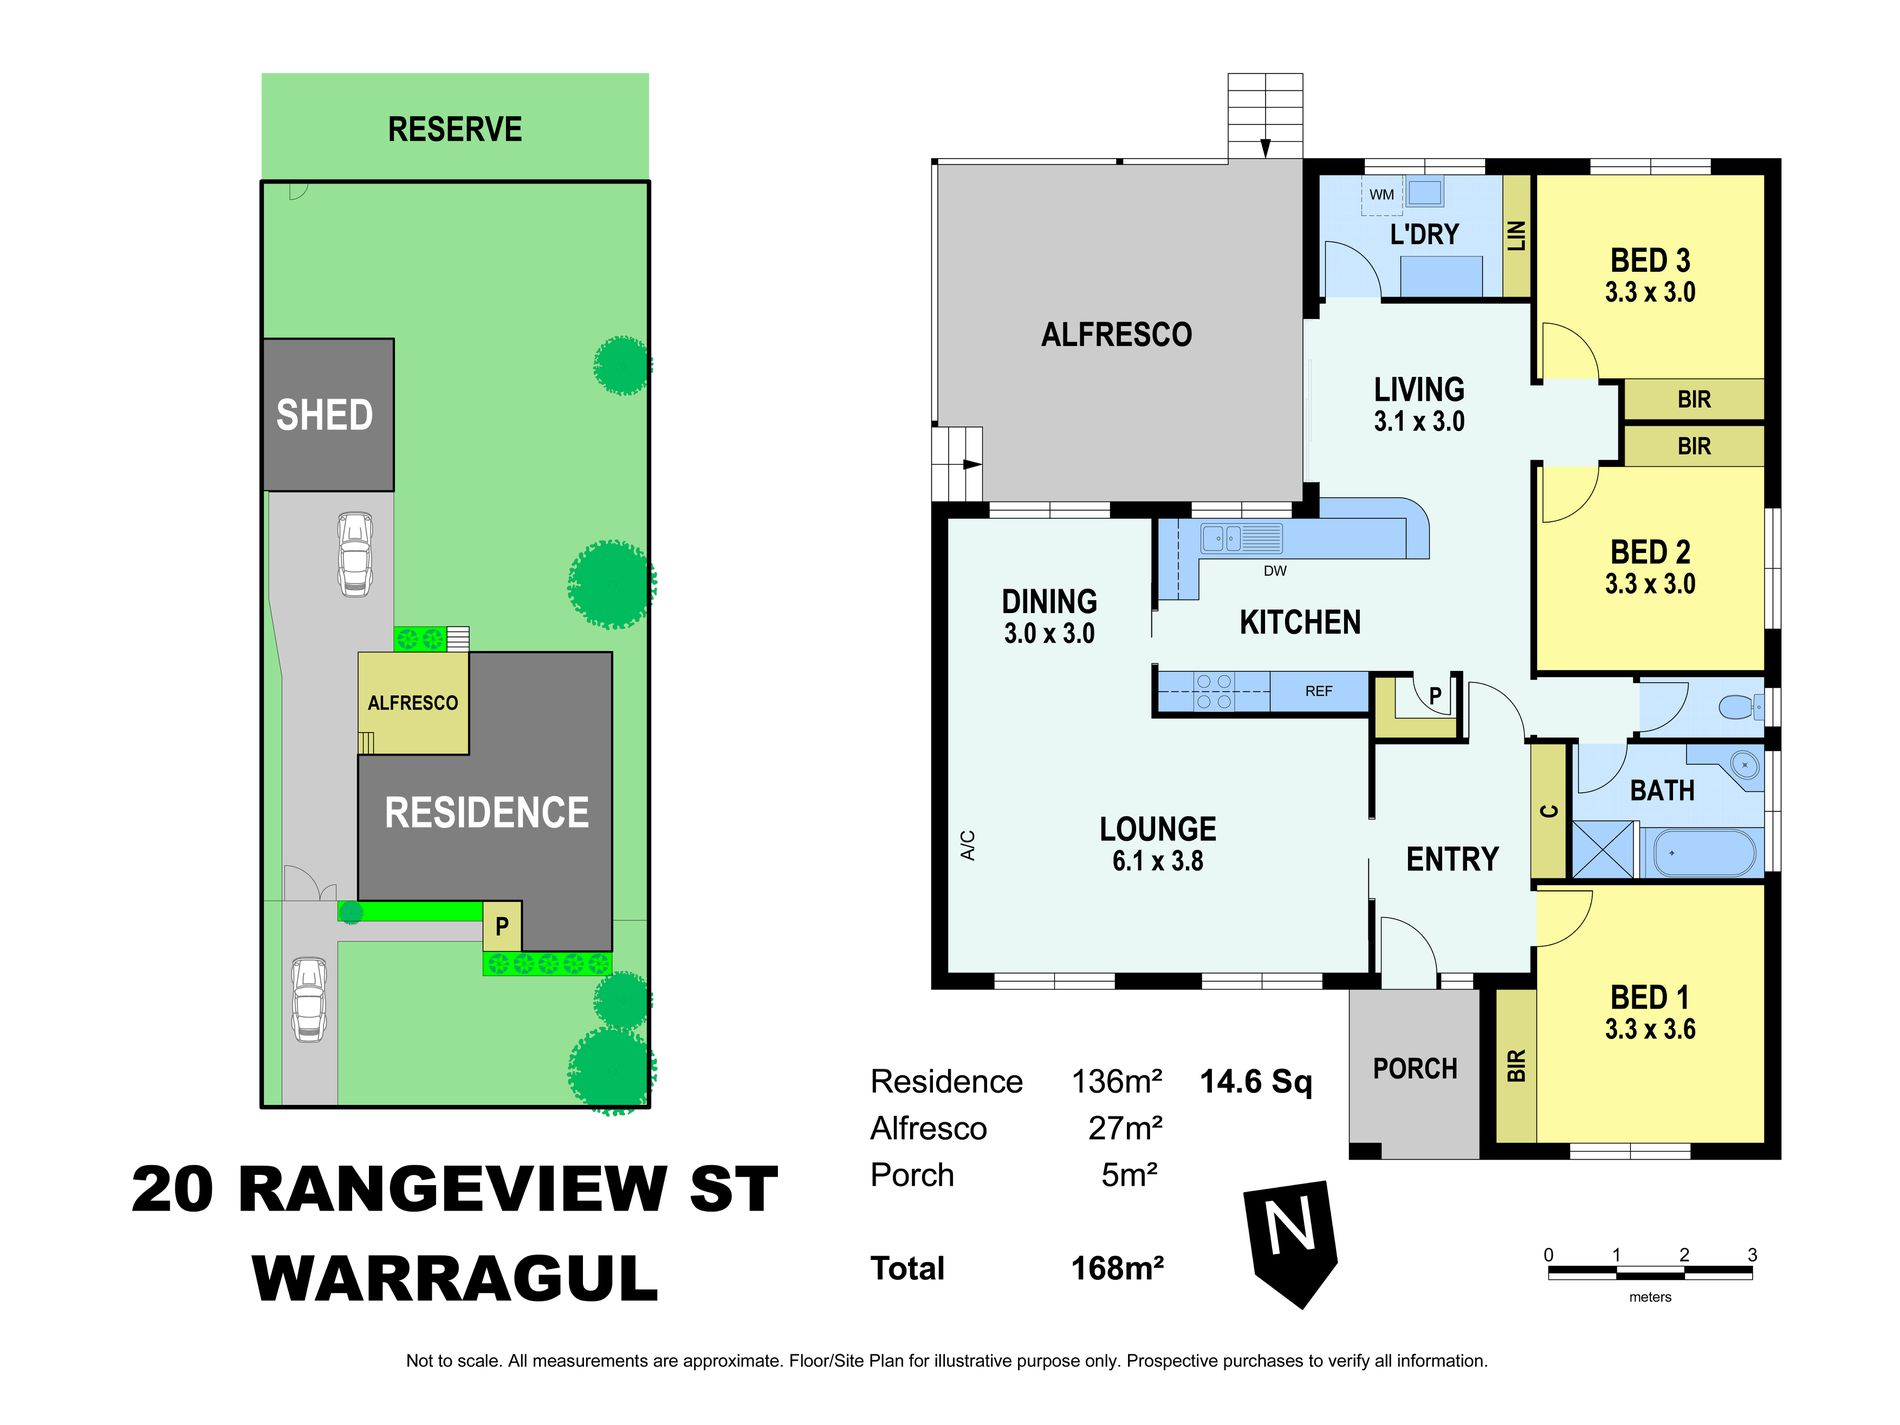 20 Rangeview Street, Warragul